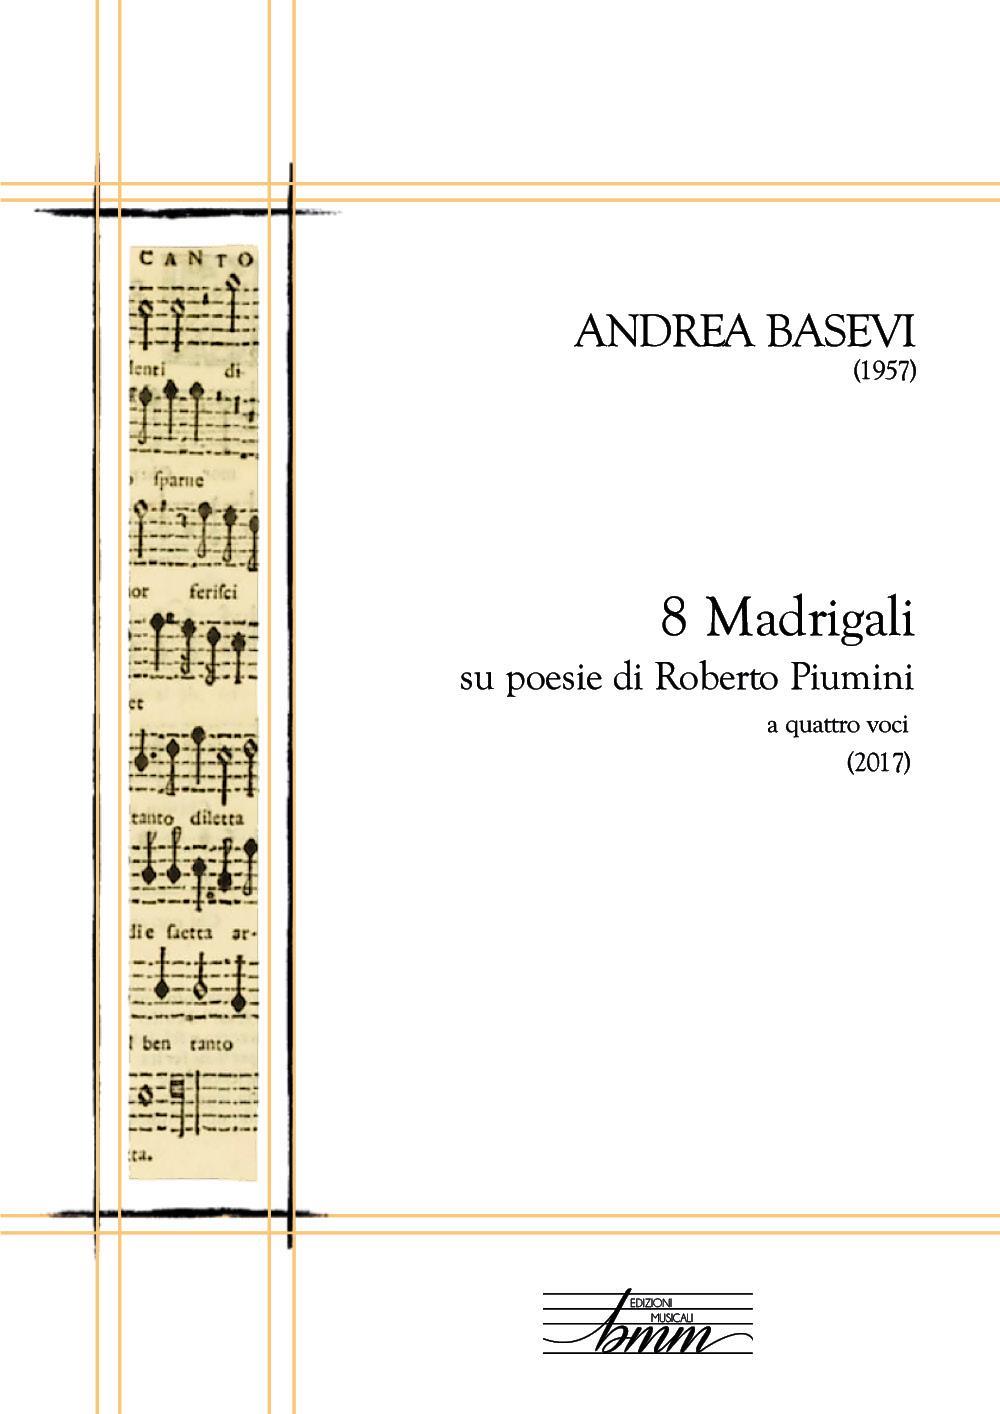 Andrea Basevi 8 Madrigali per coro misto